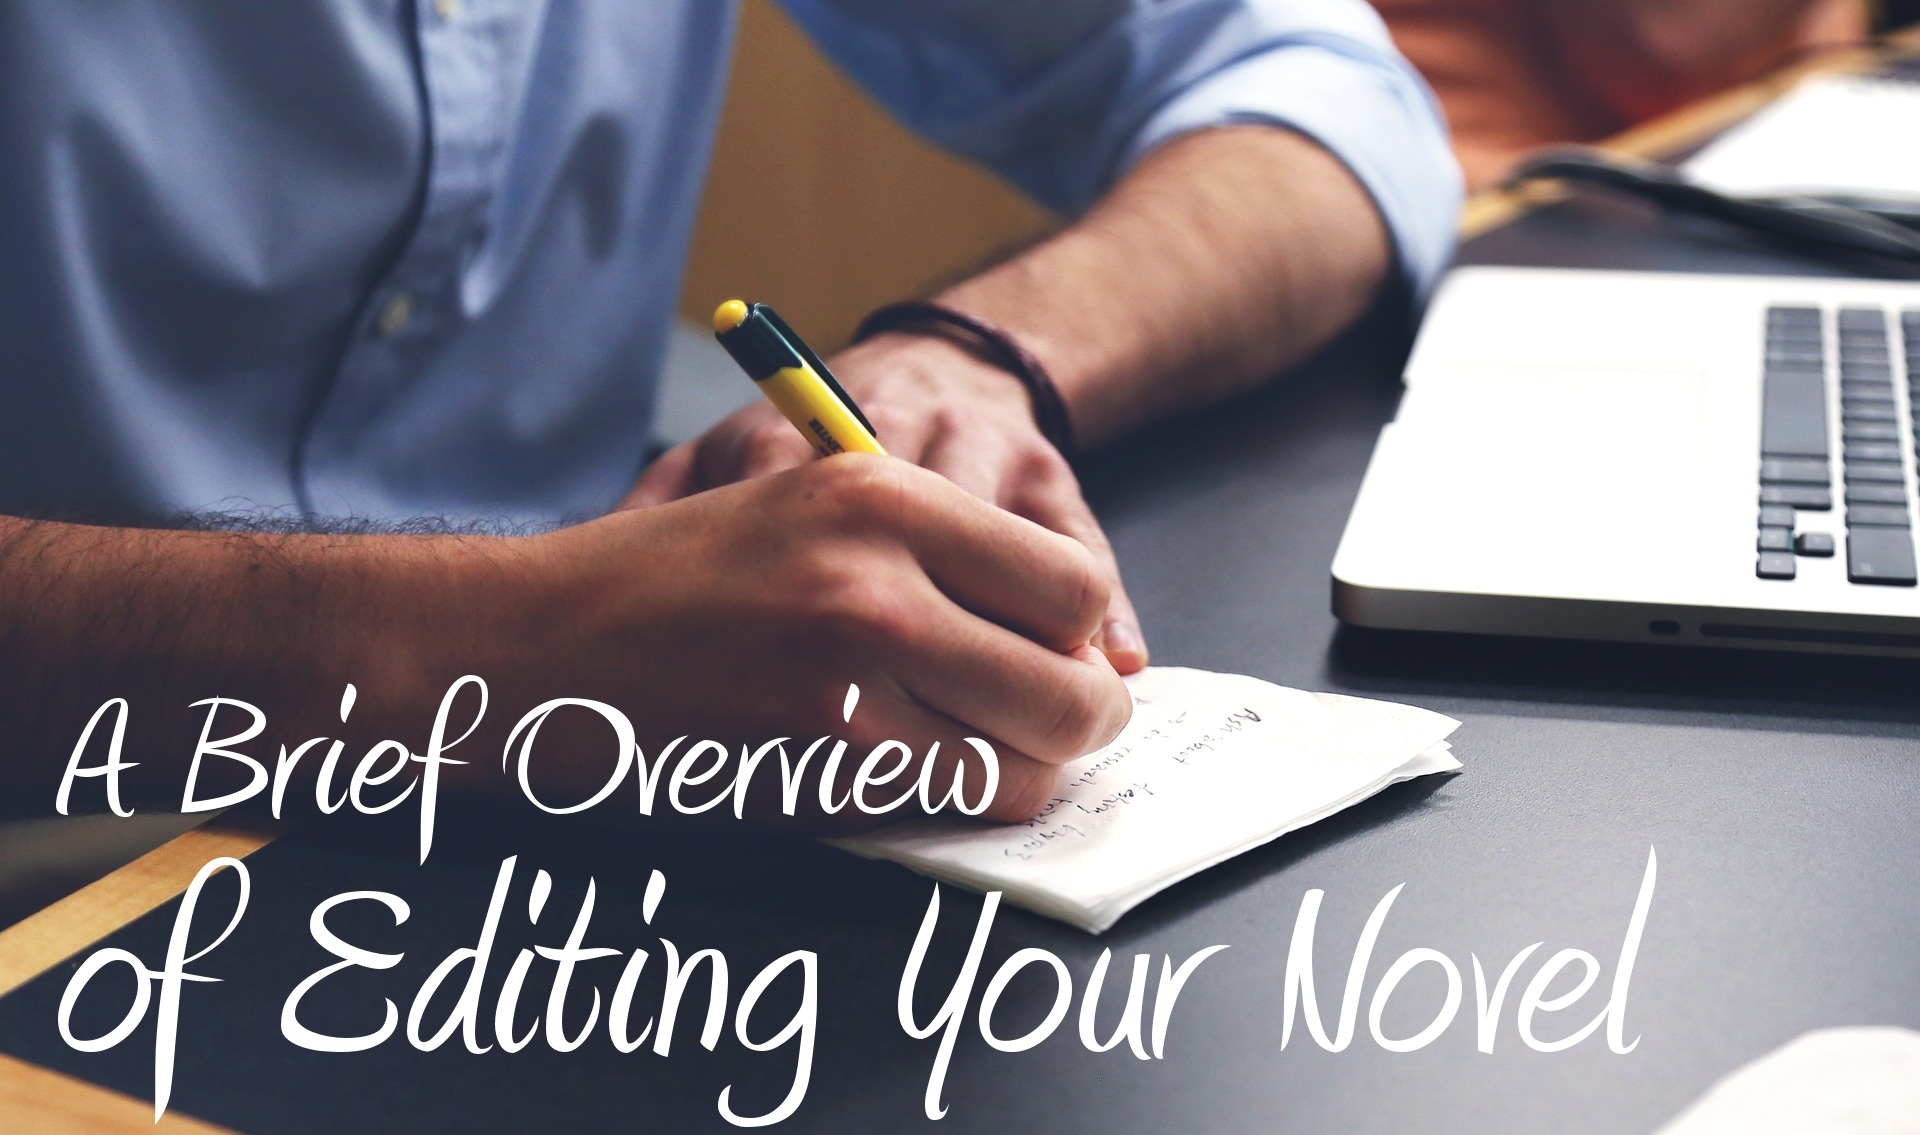 Editing your novel